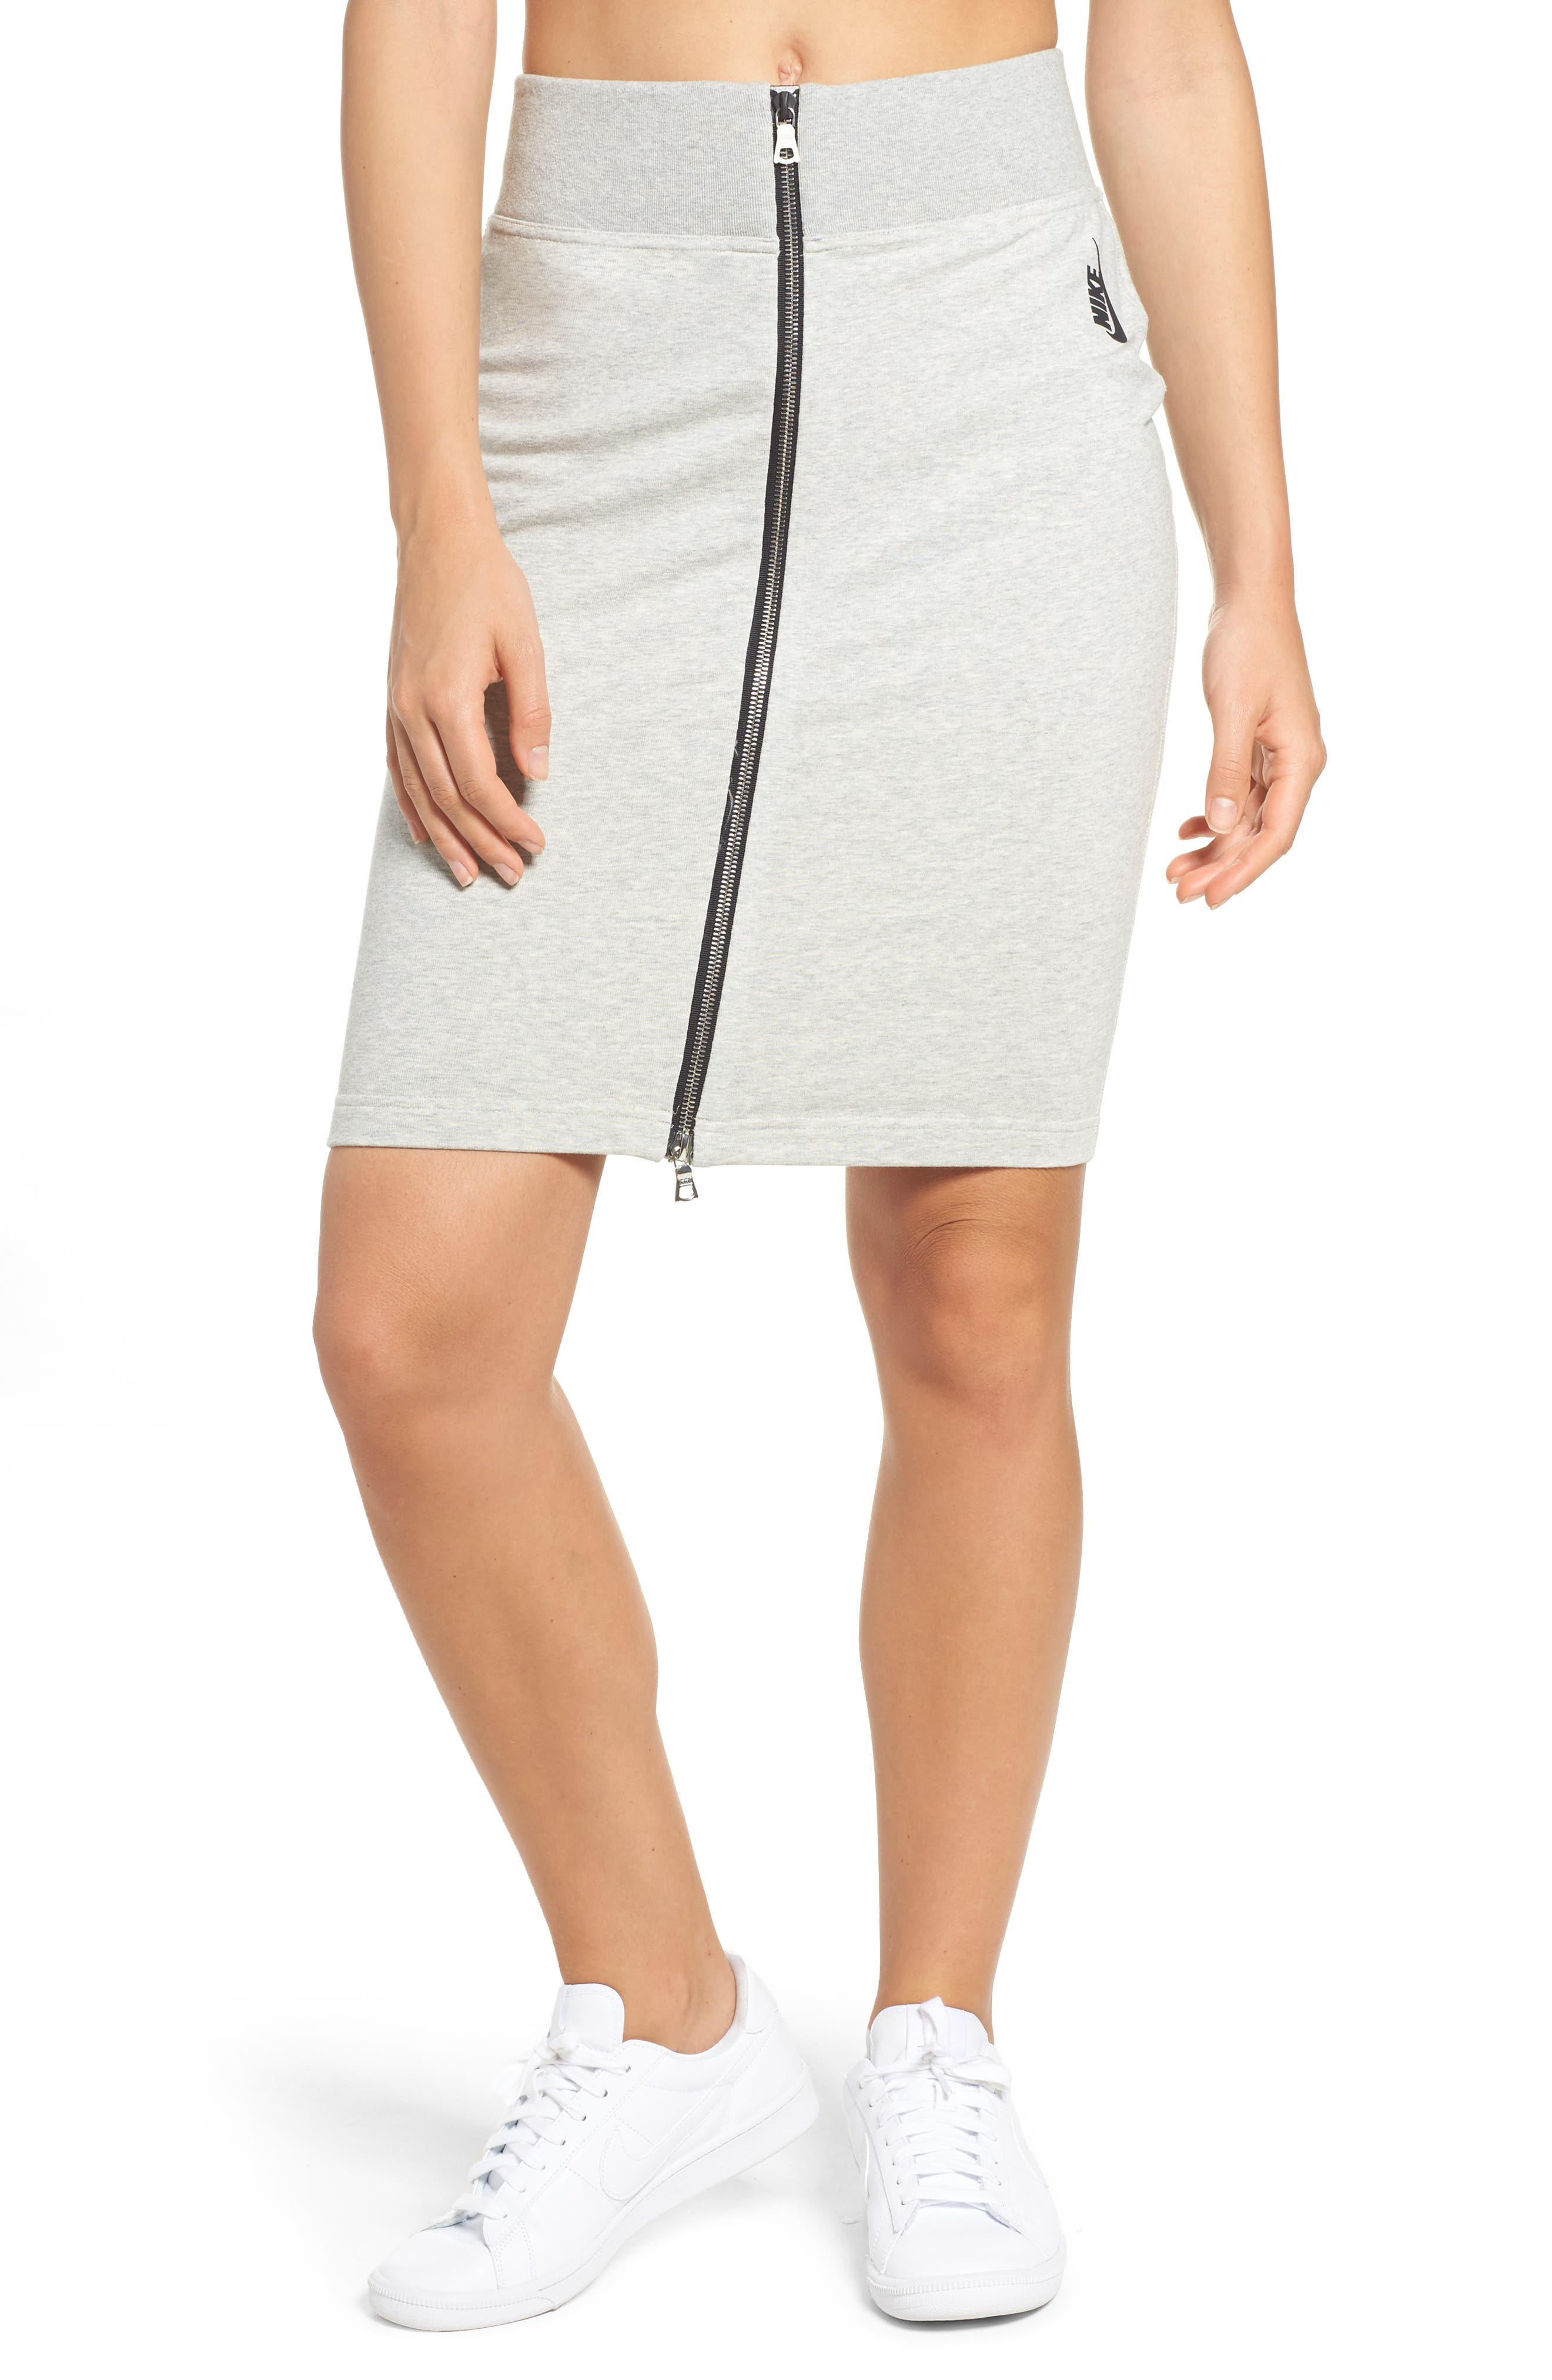 Essentials Sport Skirt,                             Main thumbnail 1, color,                             Grey Heather/ Black